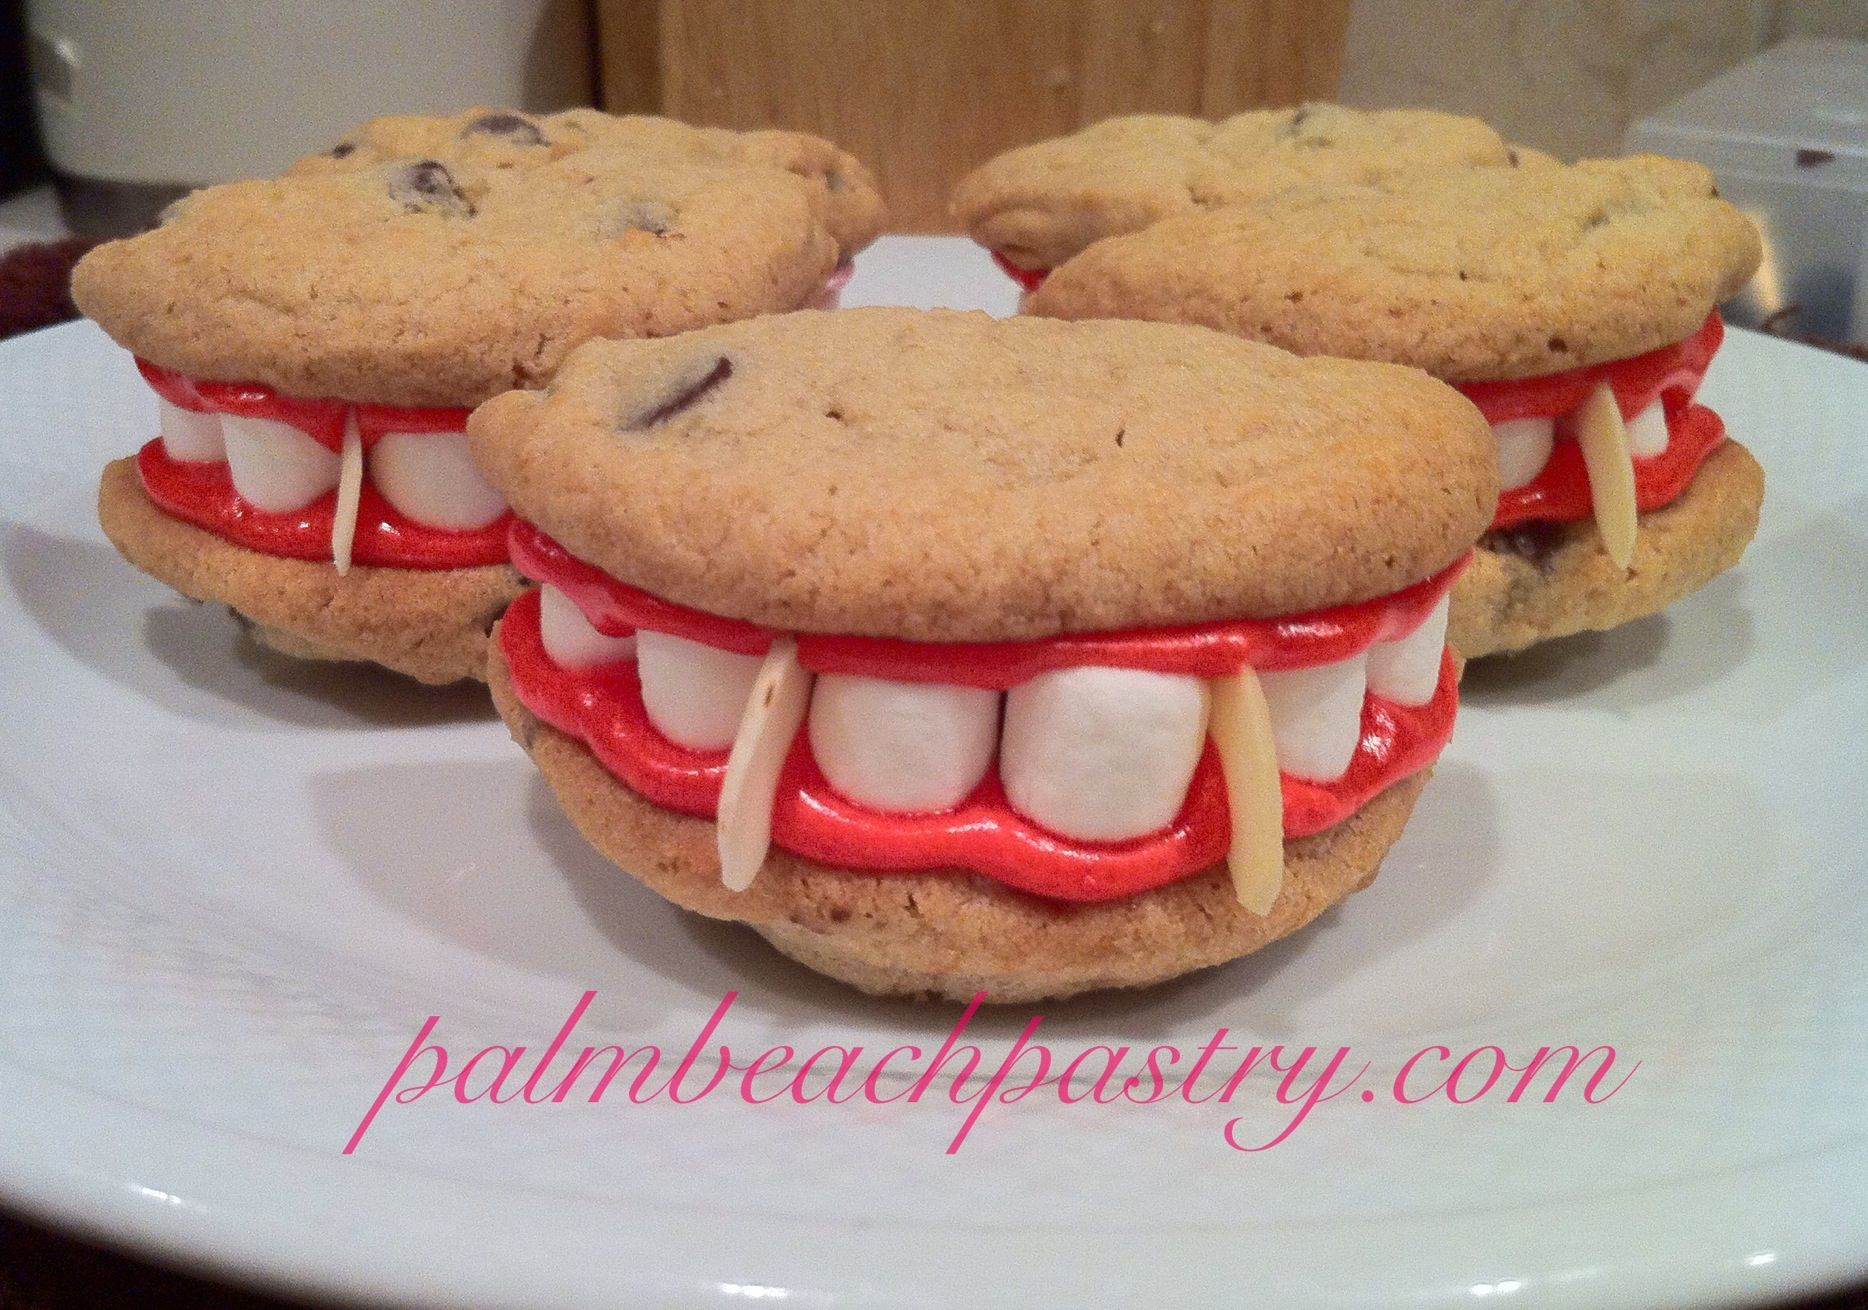 Vampire Teeth Fang Cookies Chocolate Chip Cookies With